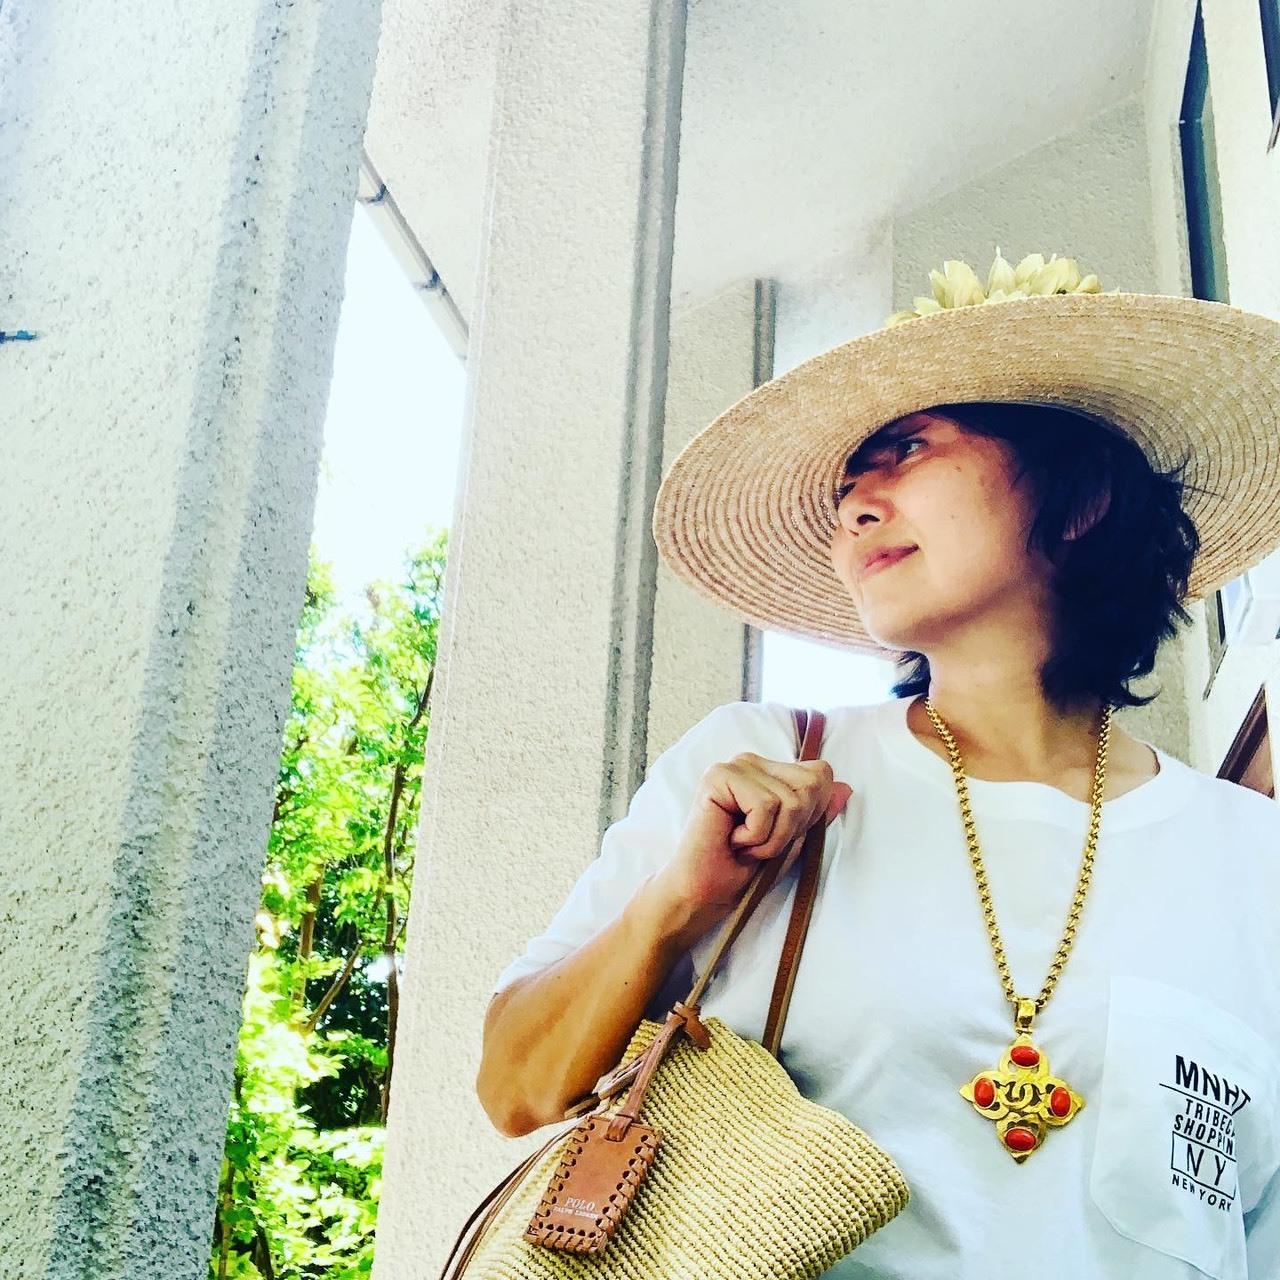 jマダムのお帽子Style♪_1_6-1